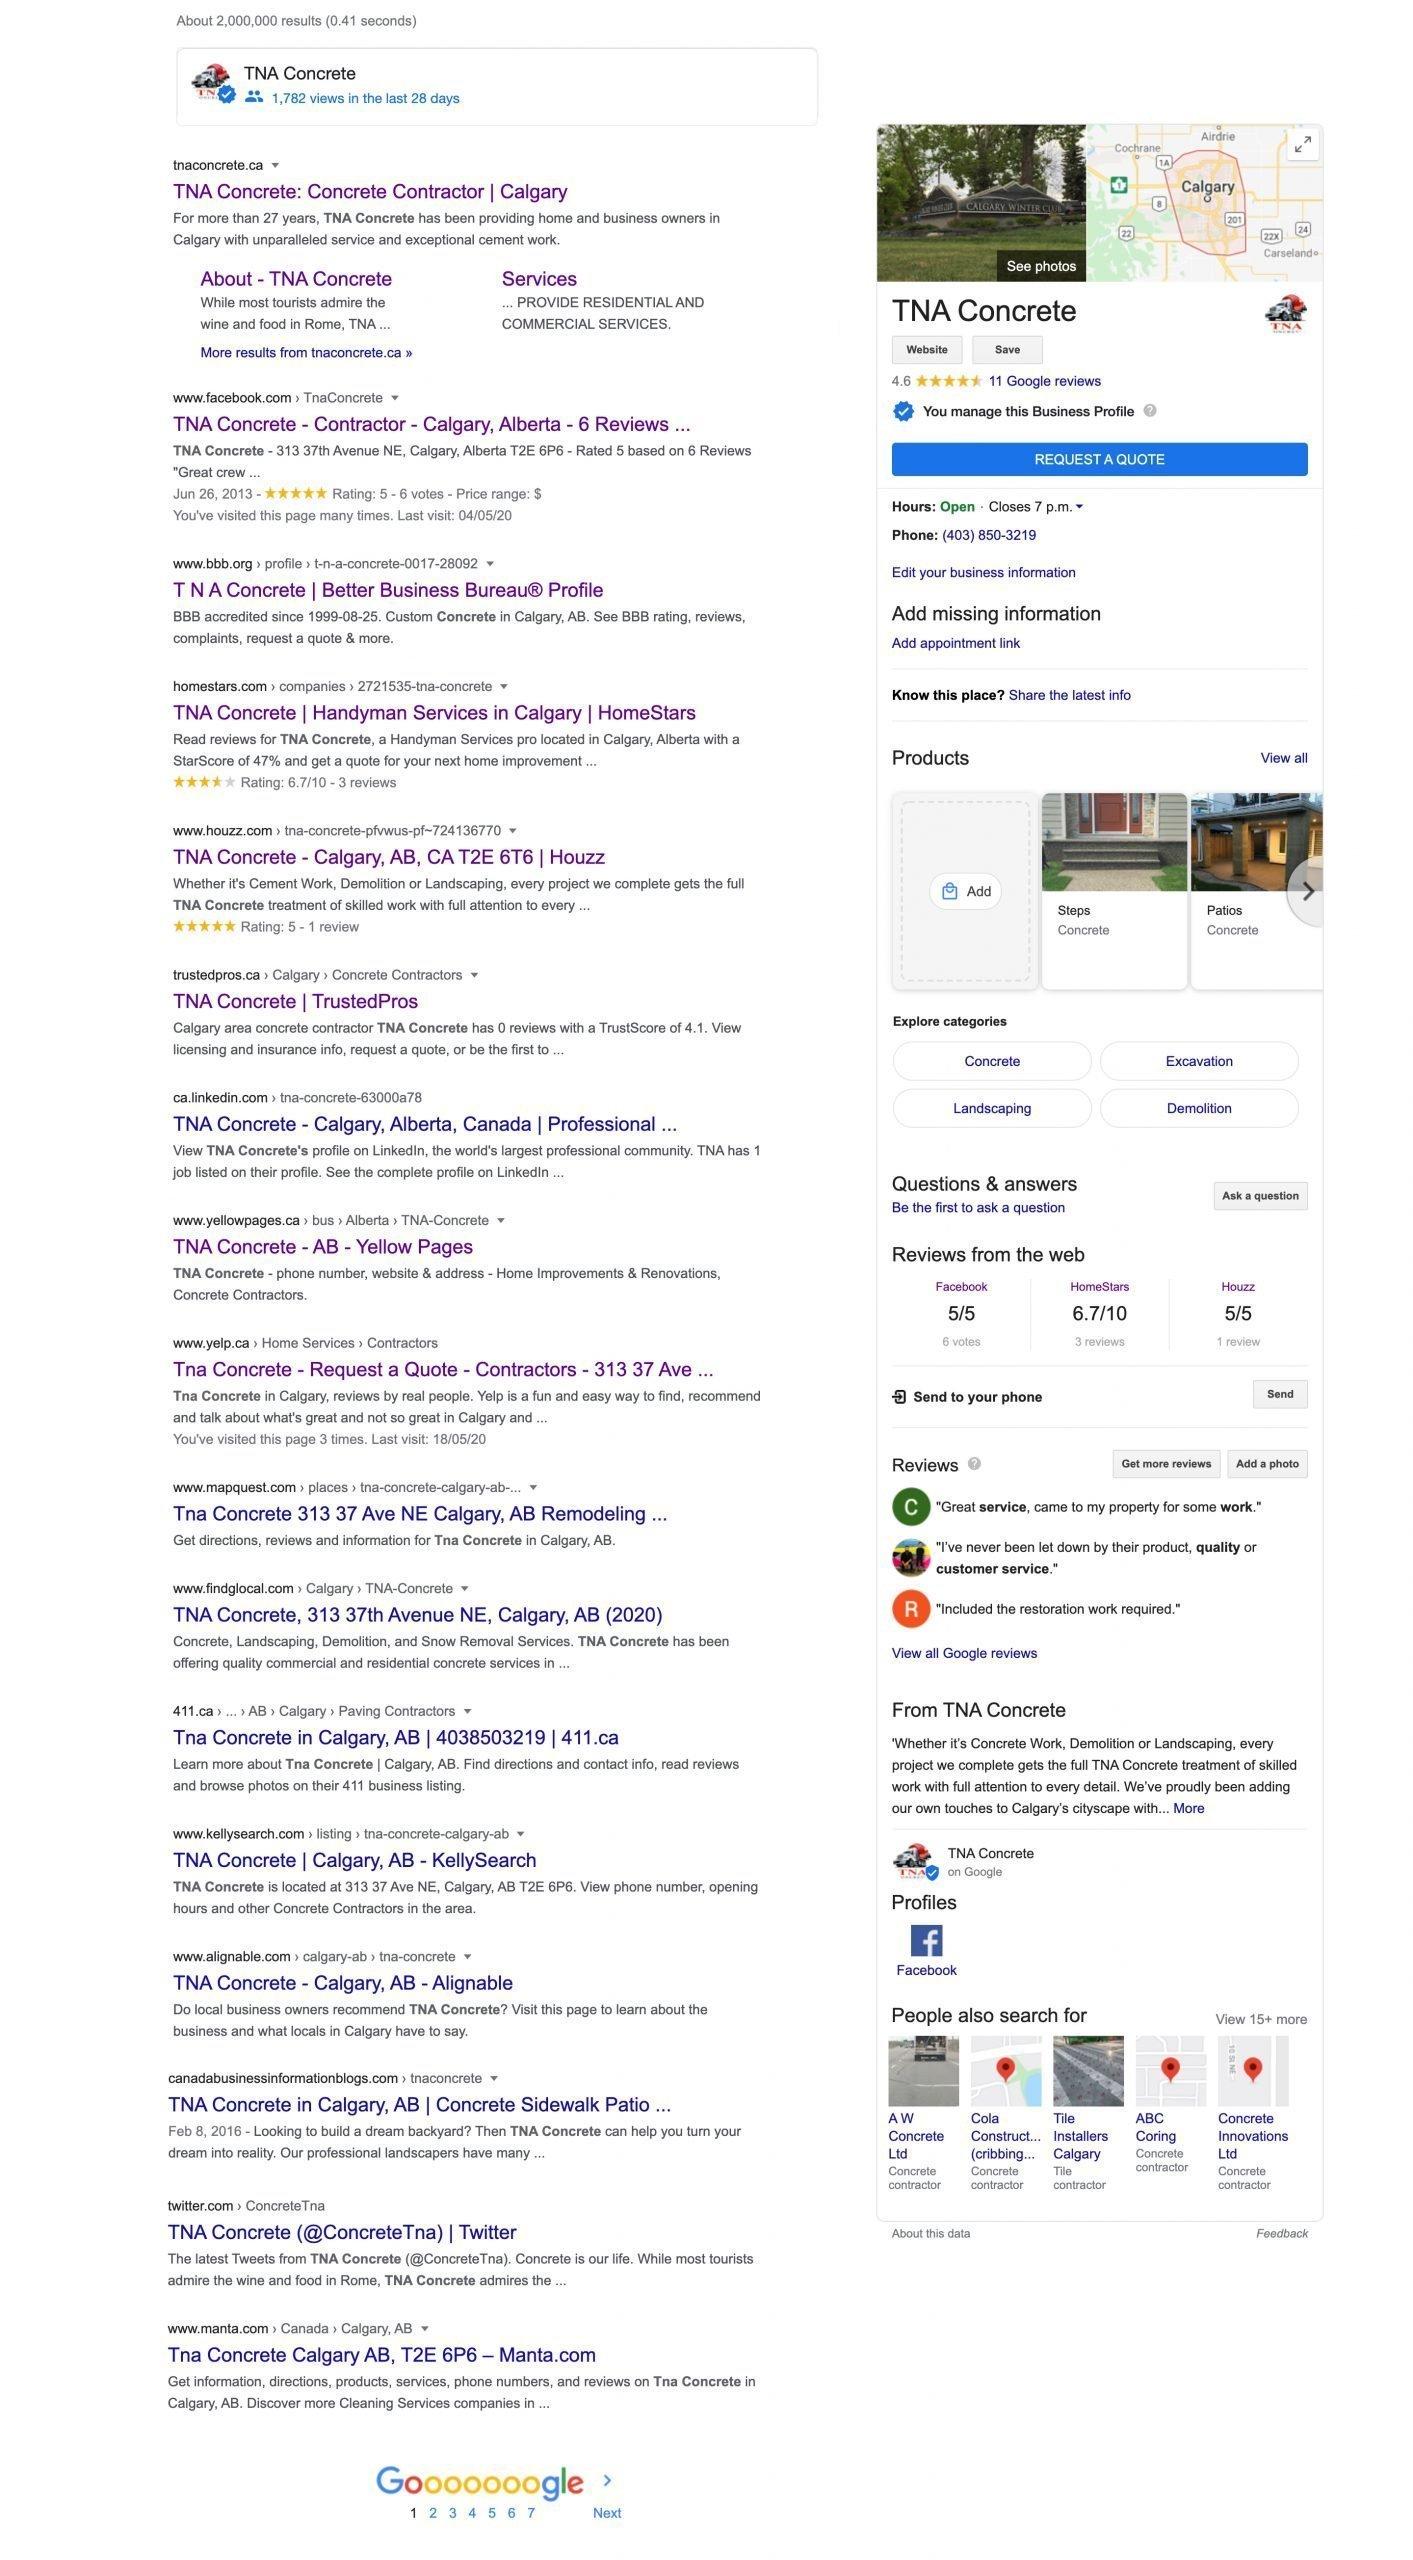 Screenshot Of TNA Concrete Google Results